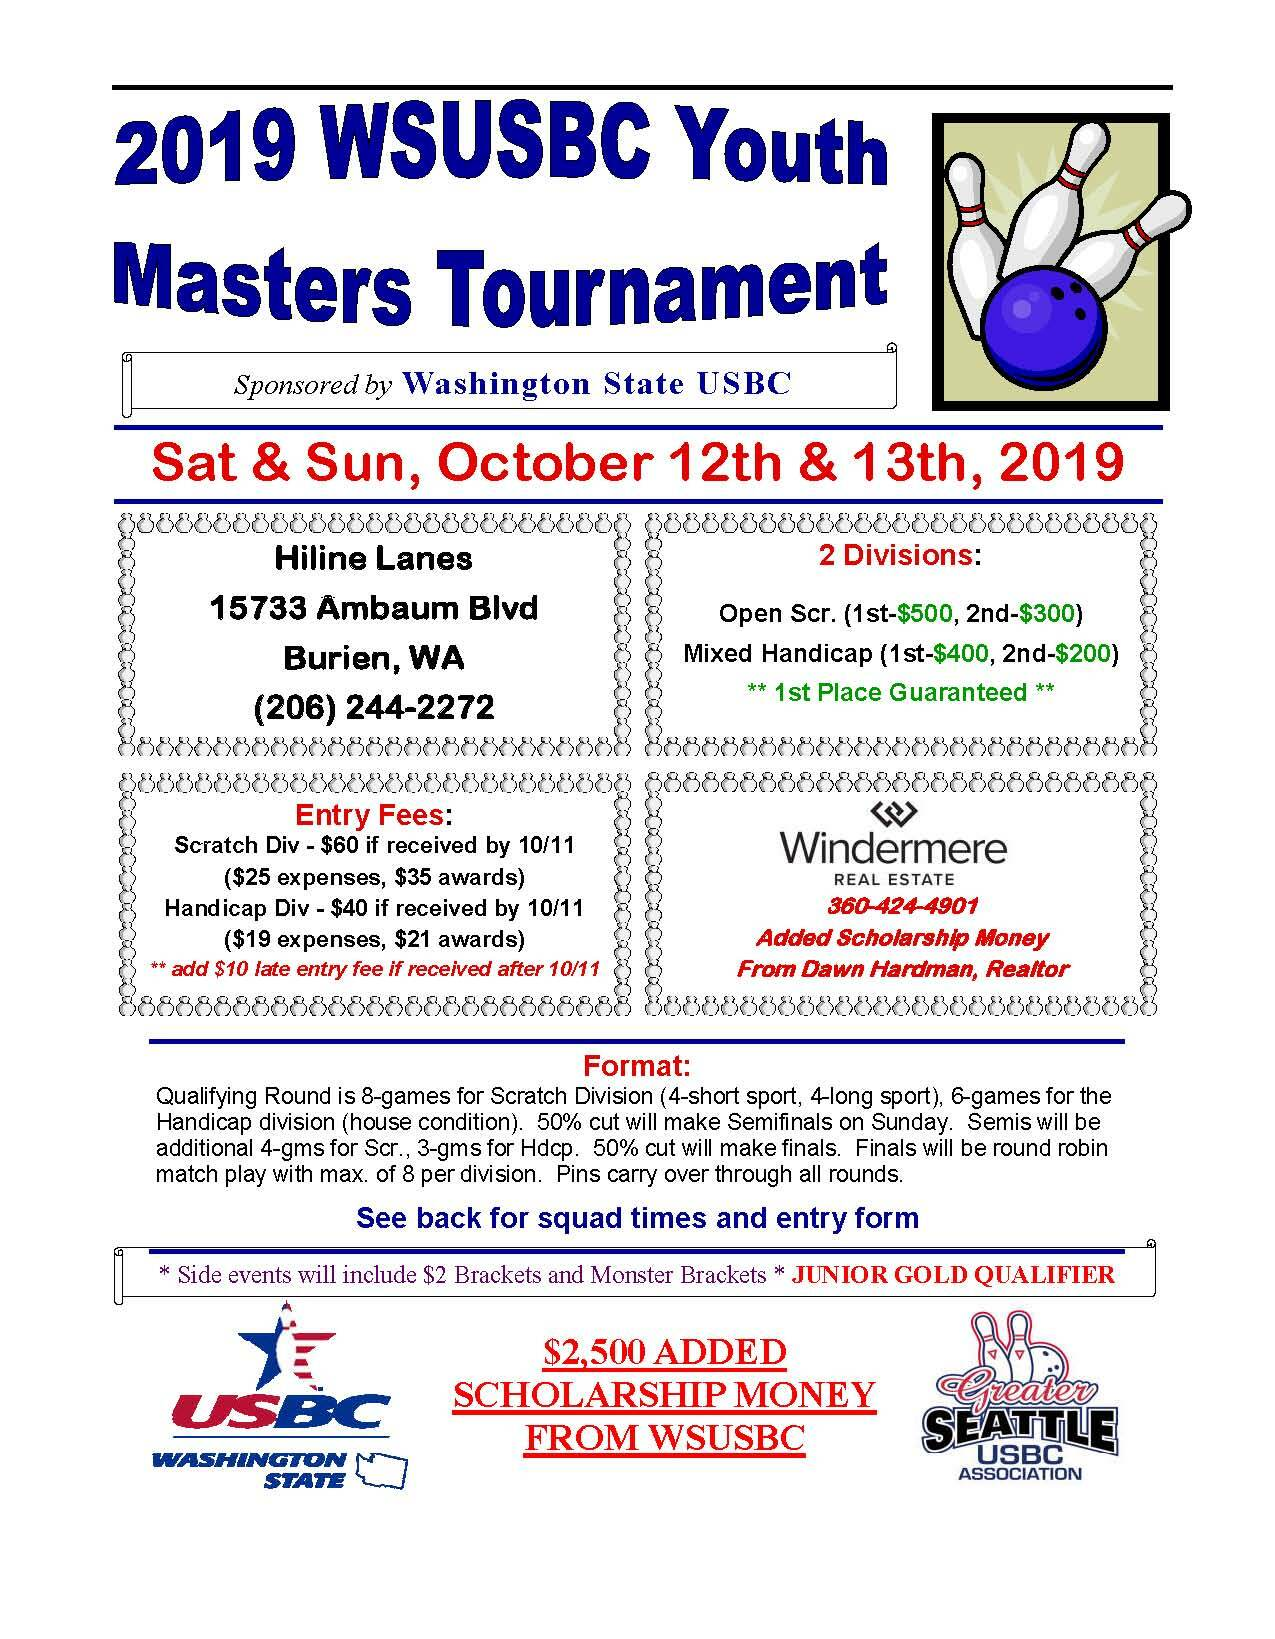 WSUSBC Youth Masters Tournament WSYM-2019